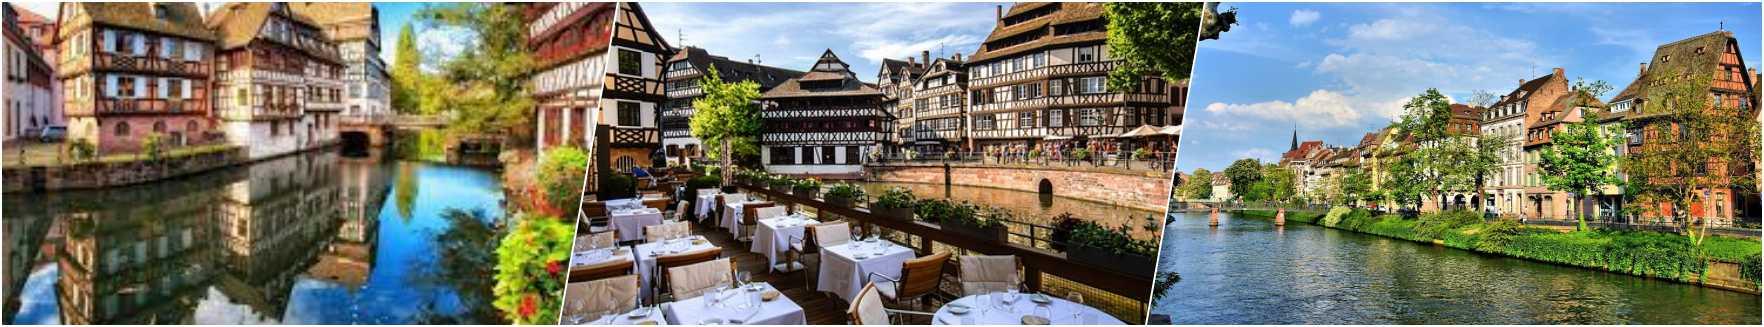 Strasbourg - Petite France - Ill River